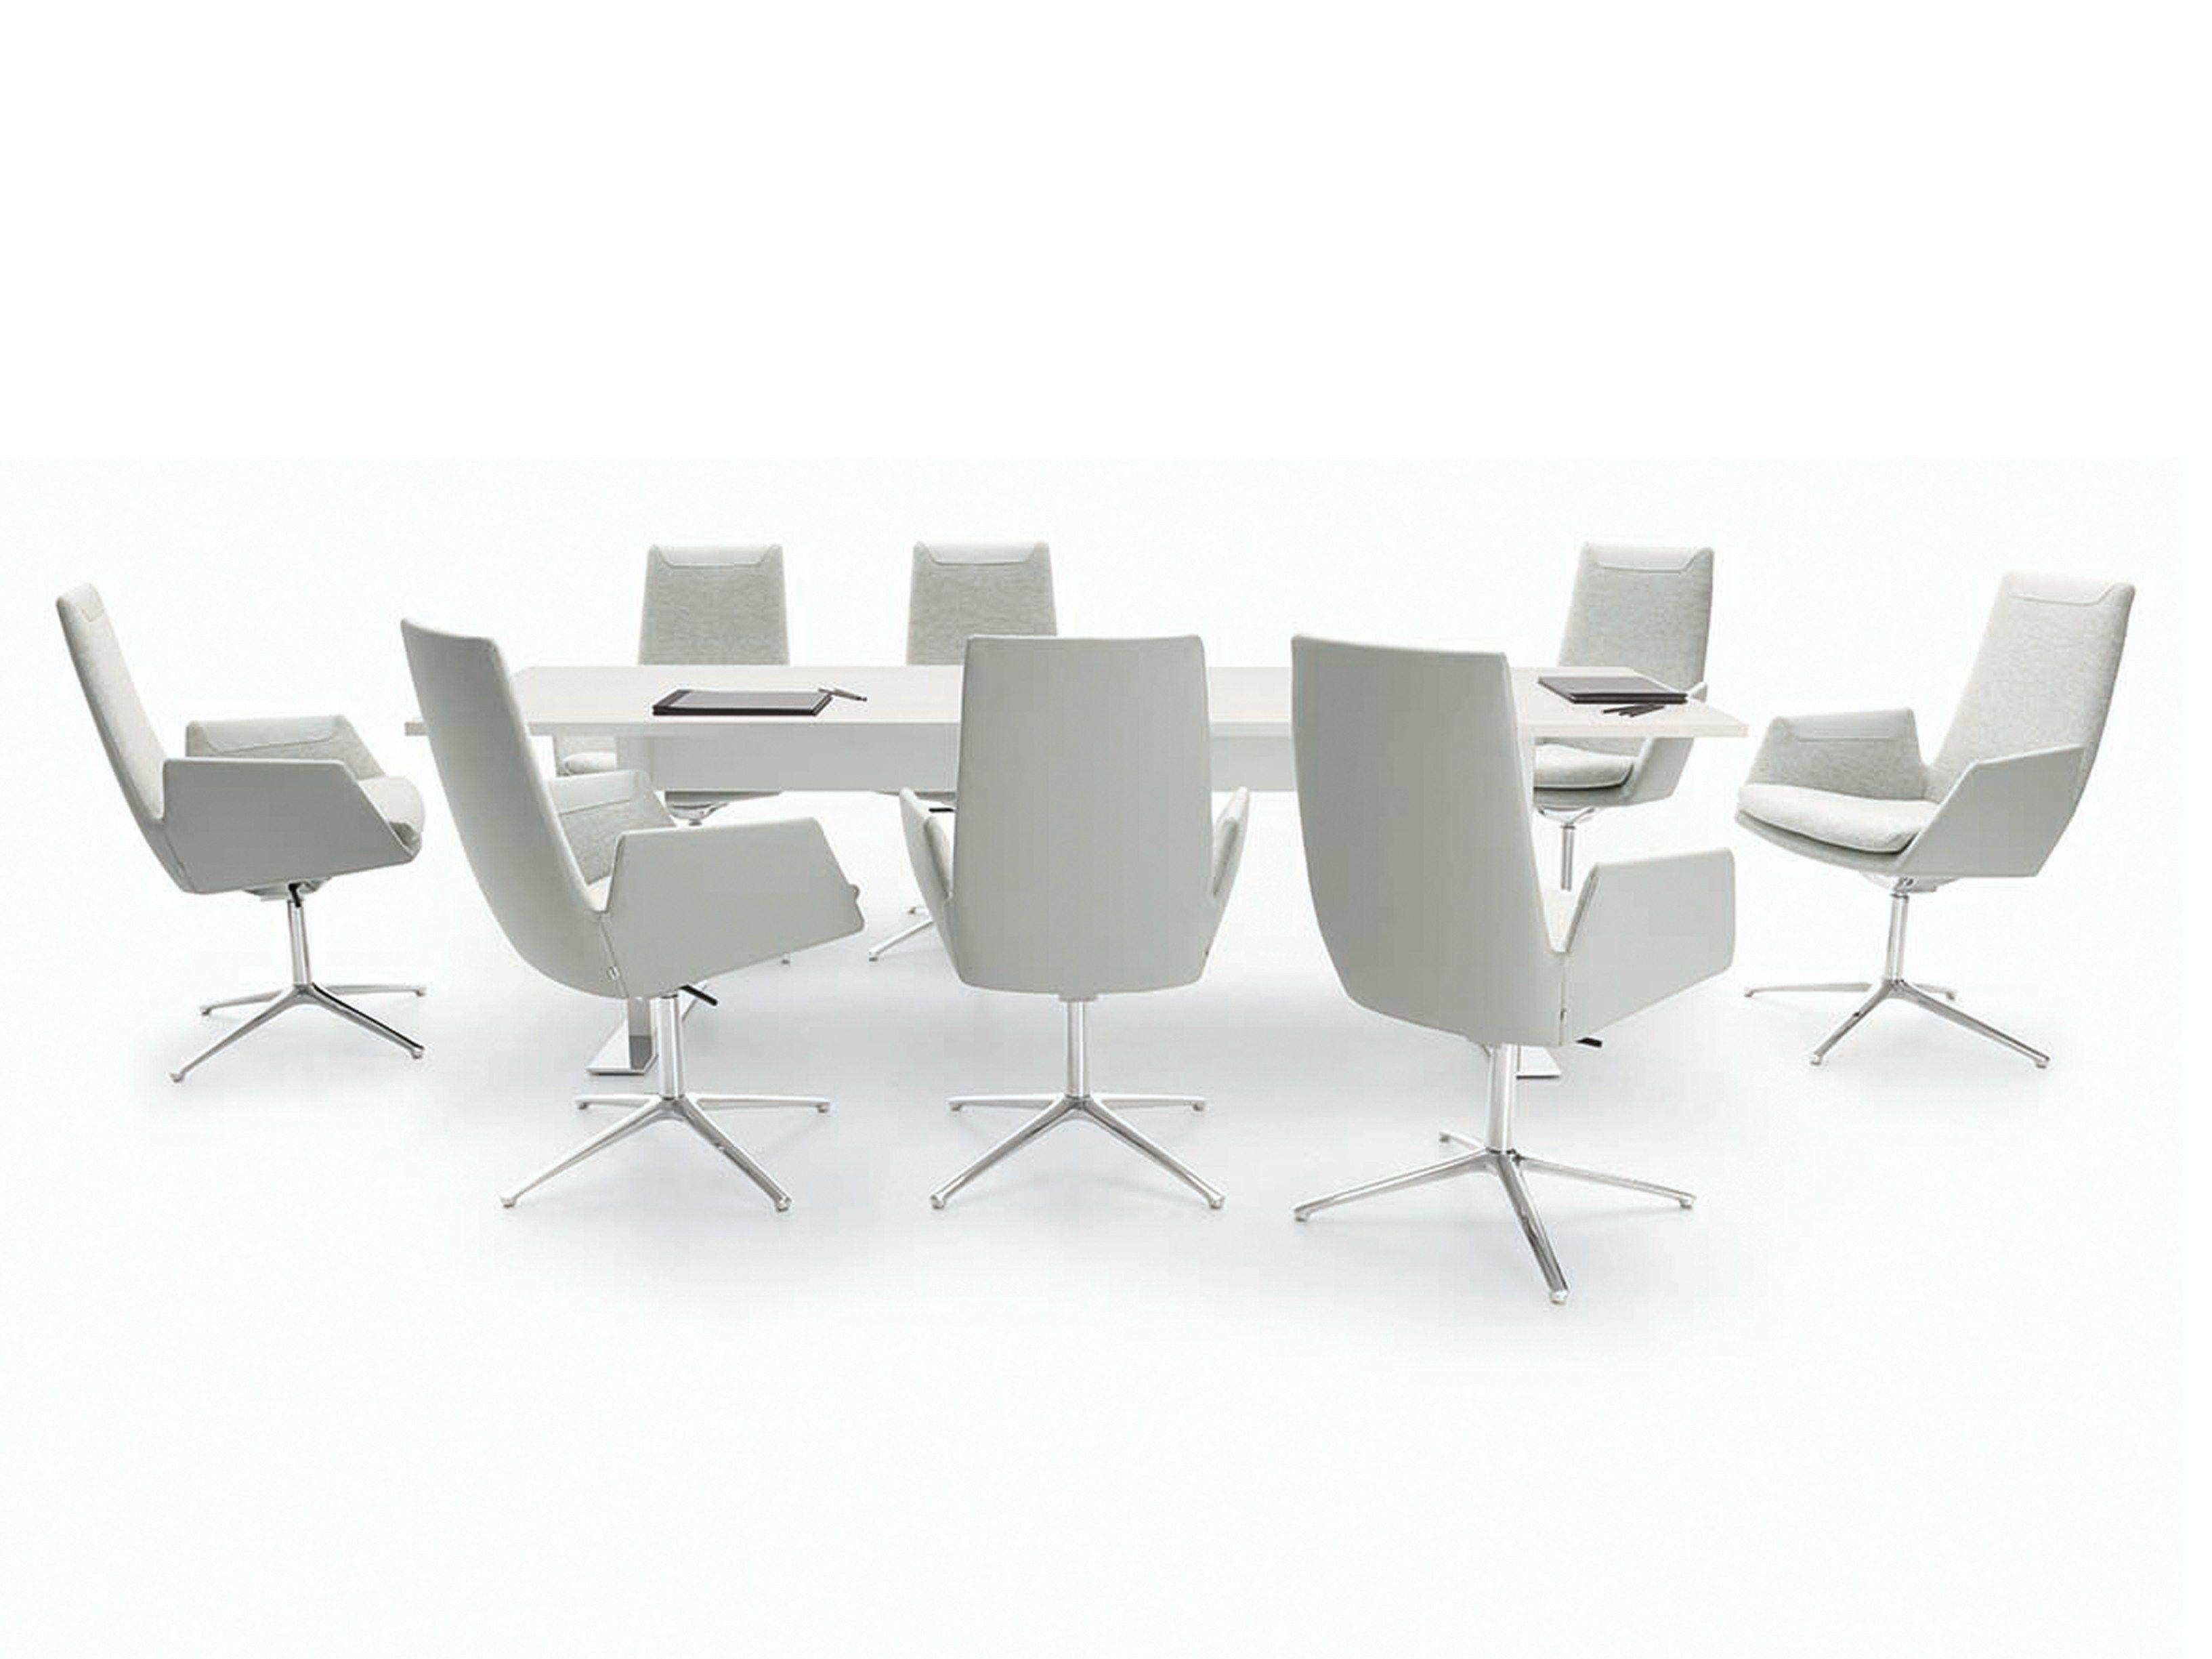 Cordia 工作椅 By Cor Sitzmöbel Helmut Lübke 设计师jehs Laub 办公类